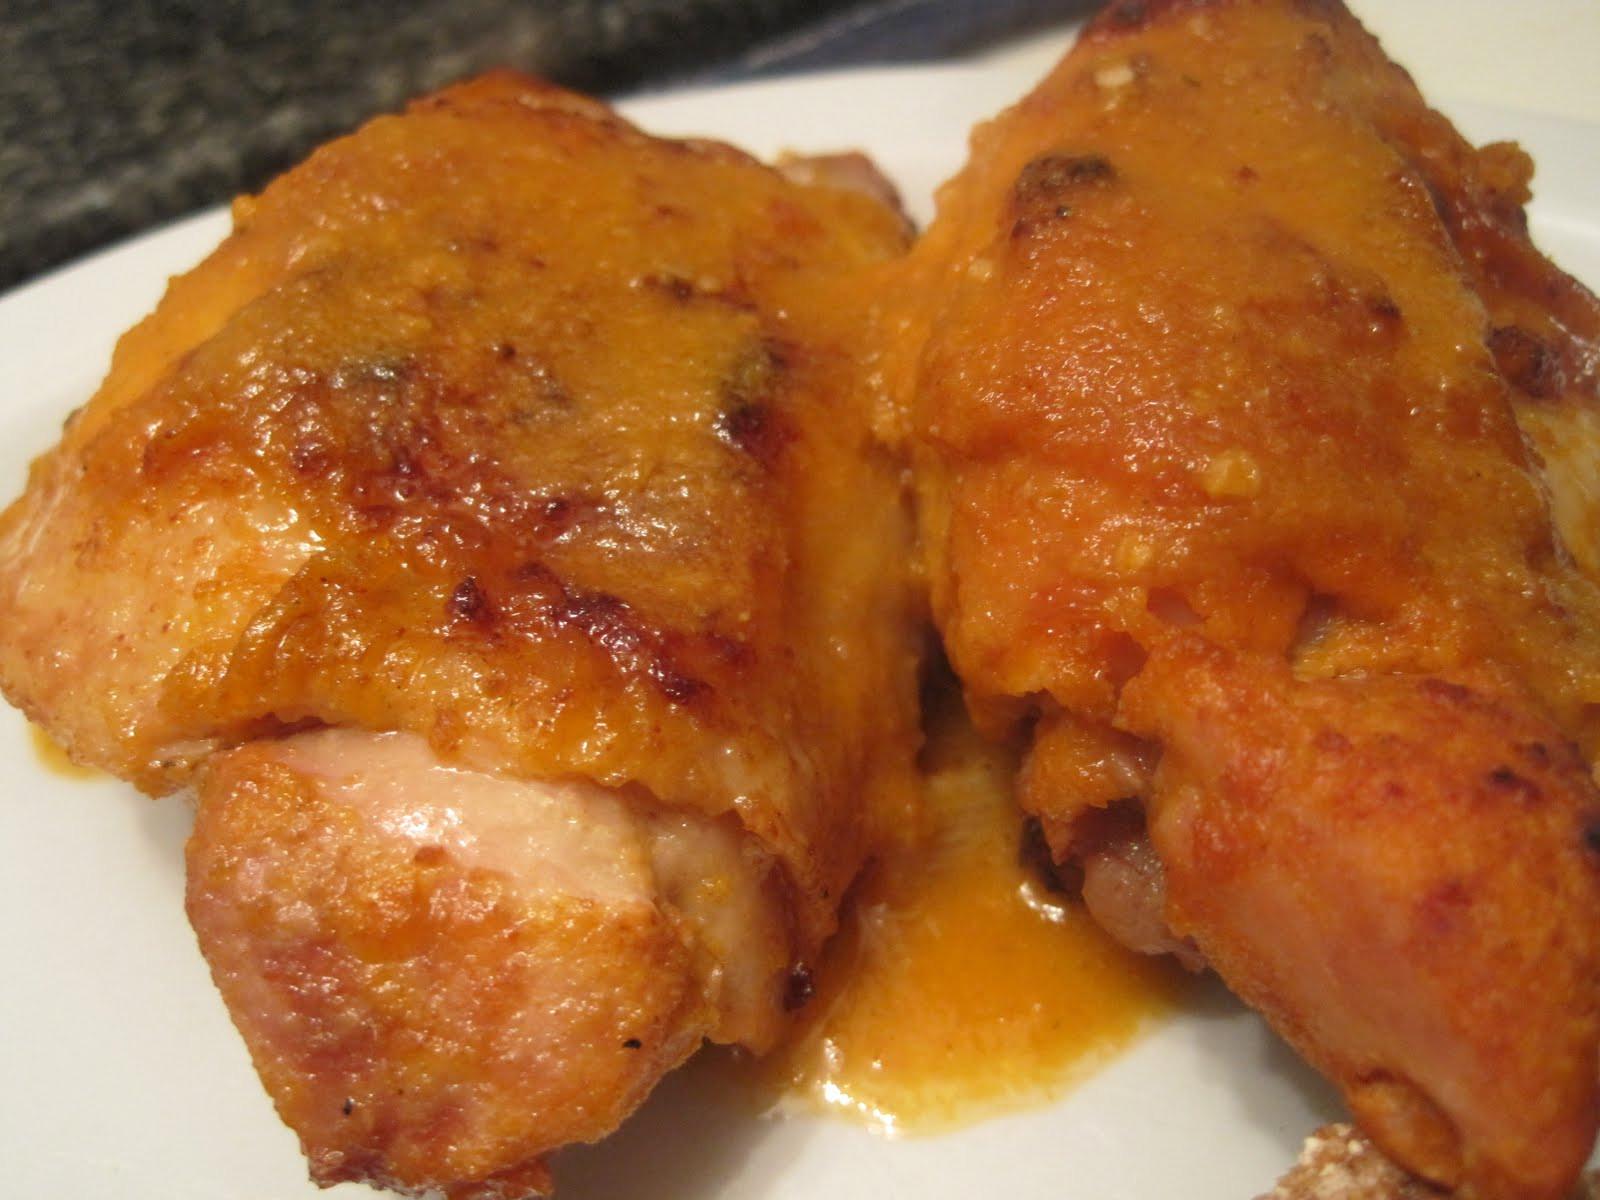 Chicken Thighs In Crock Pot  Corcoran Street Kitchen Saucy Chicken Thighs in the Crock Pot